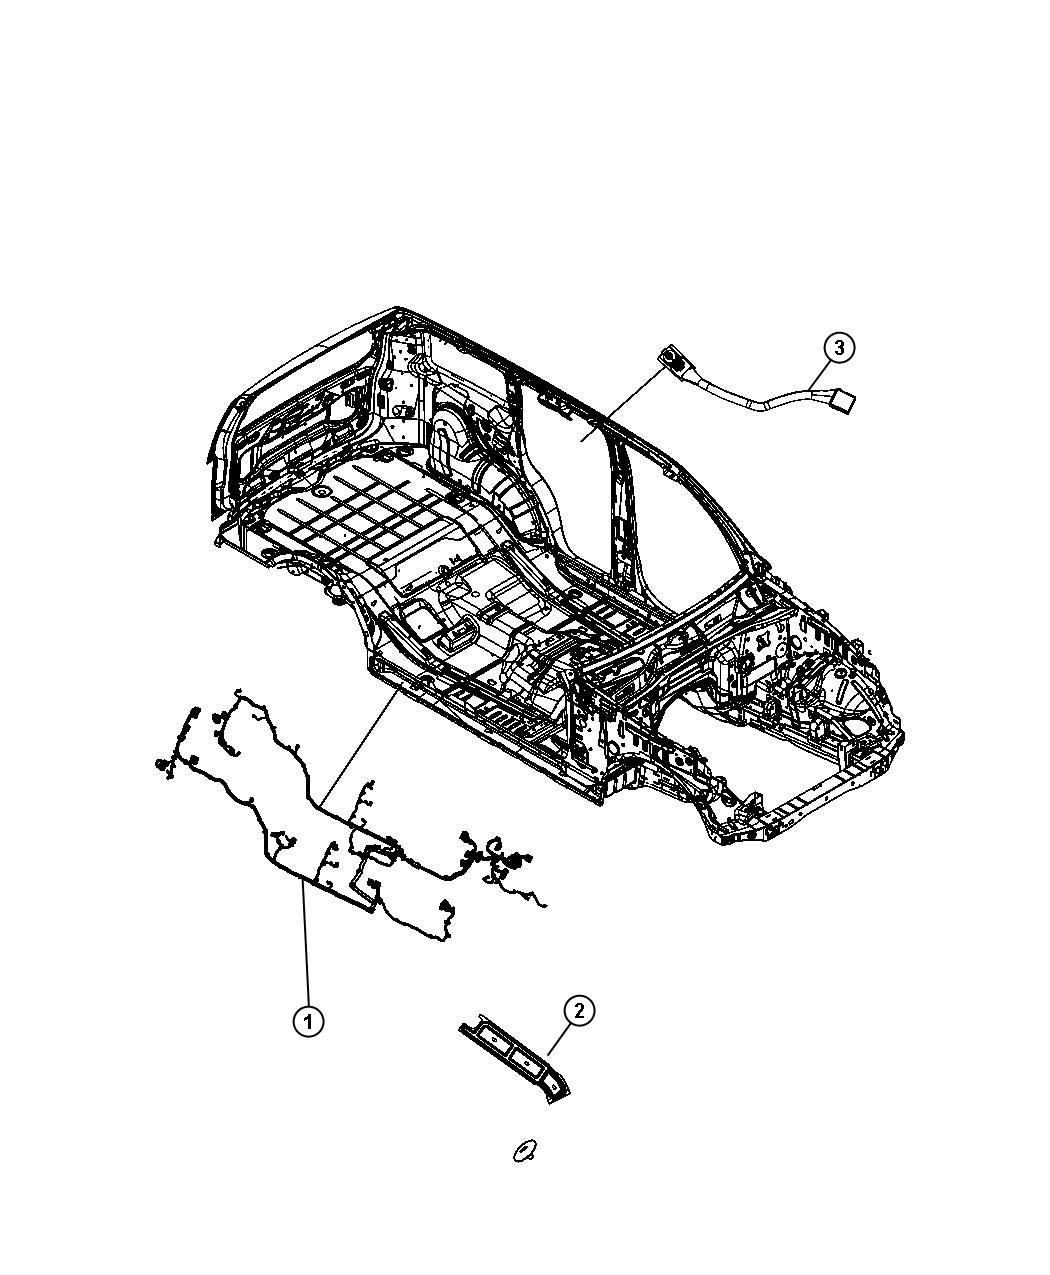 Dodge Nitro Wiring Body Export Ret Res Req Rel